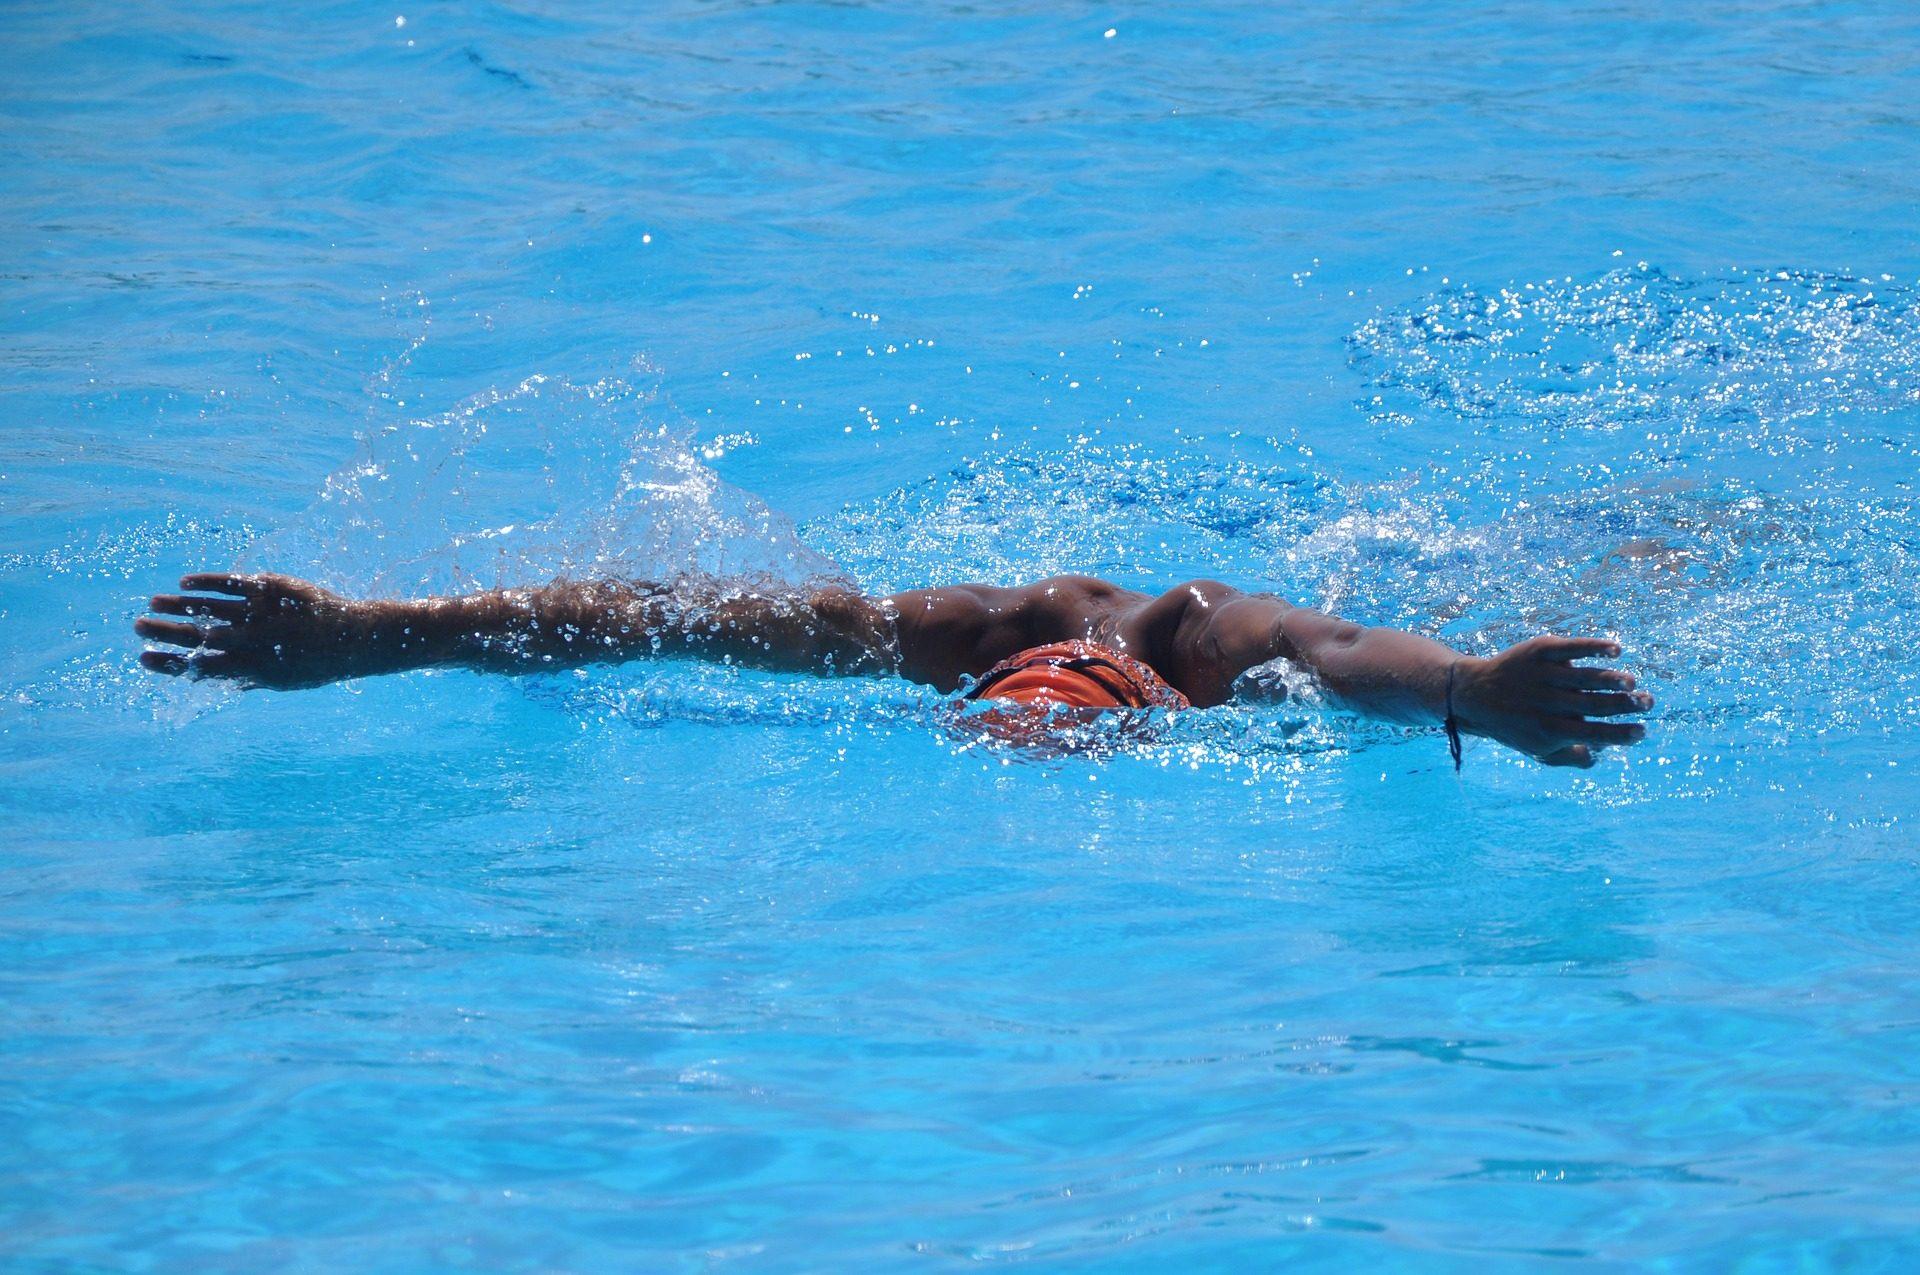 nadador, 游泳, 竞争, 职业生涯, 中风, 帽 - 高清壁纸 - 教授-falken.com